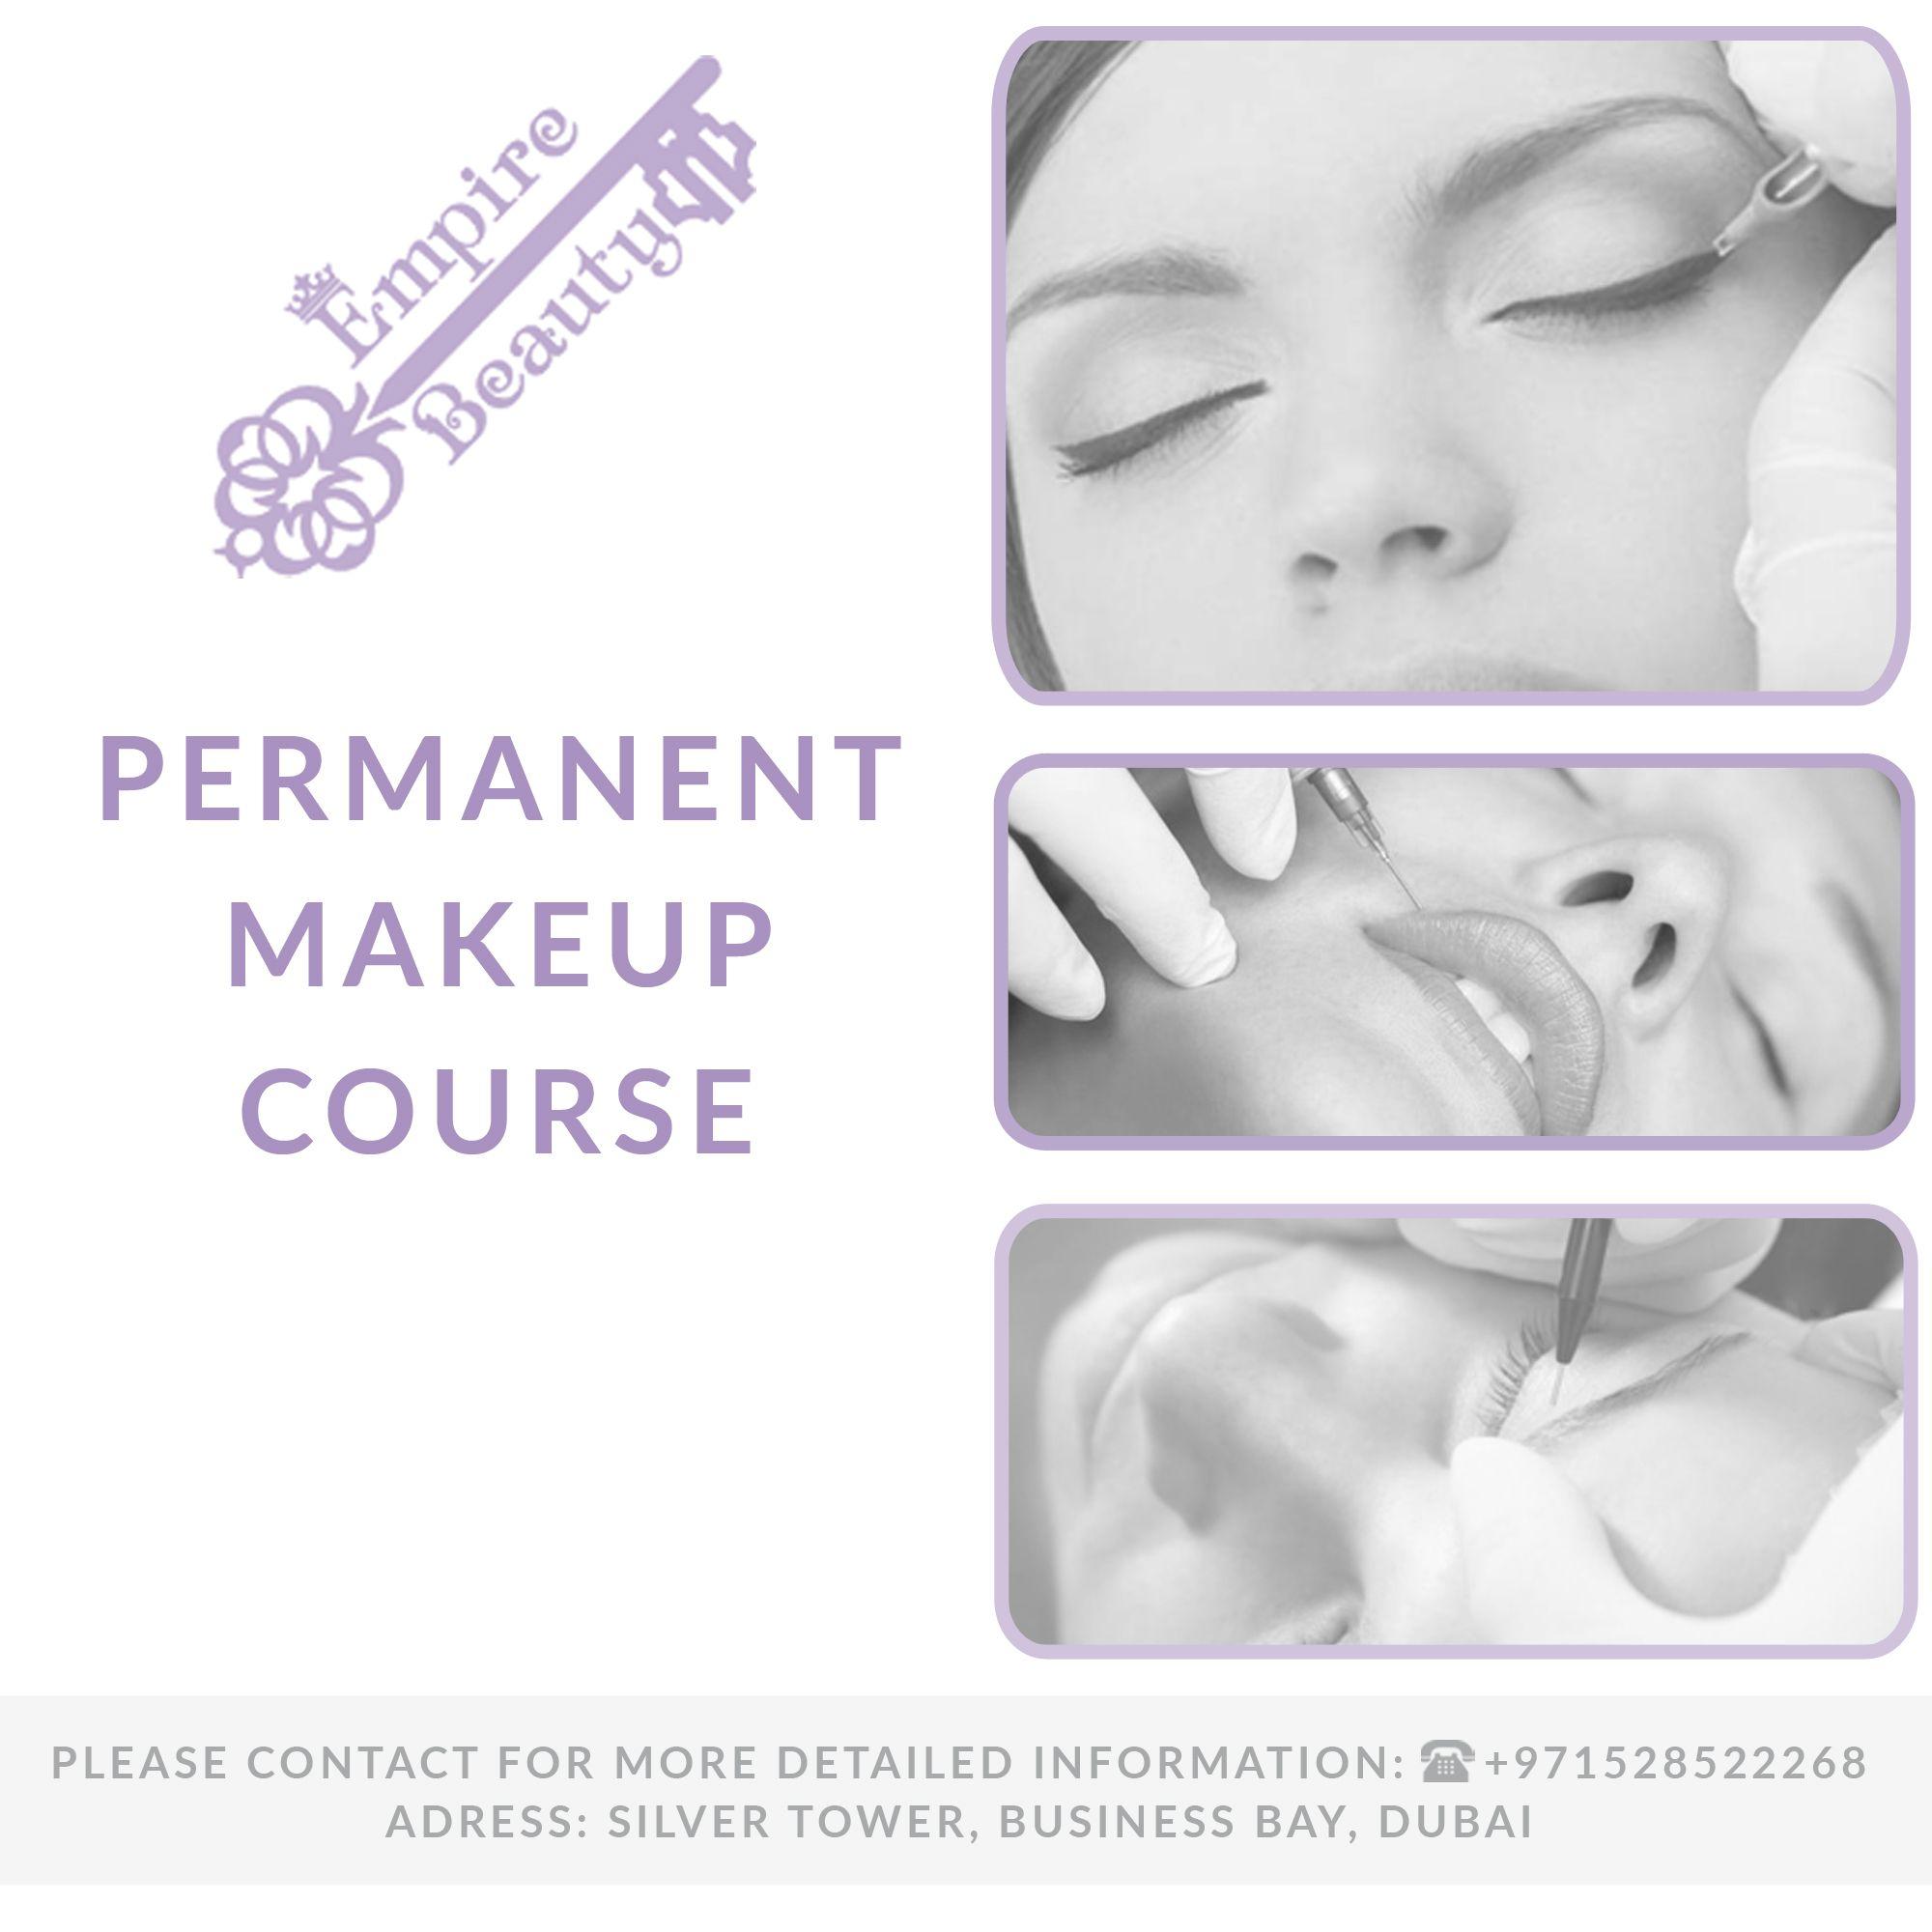 Permanent makeup training curses Permanent makeup courses